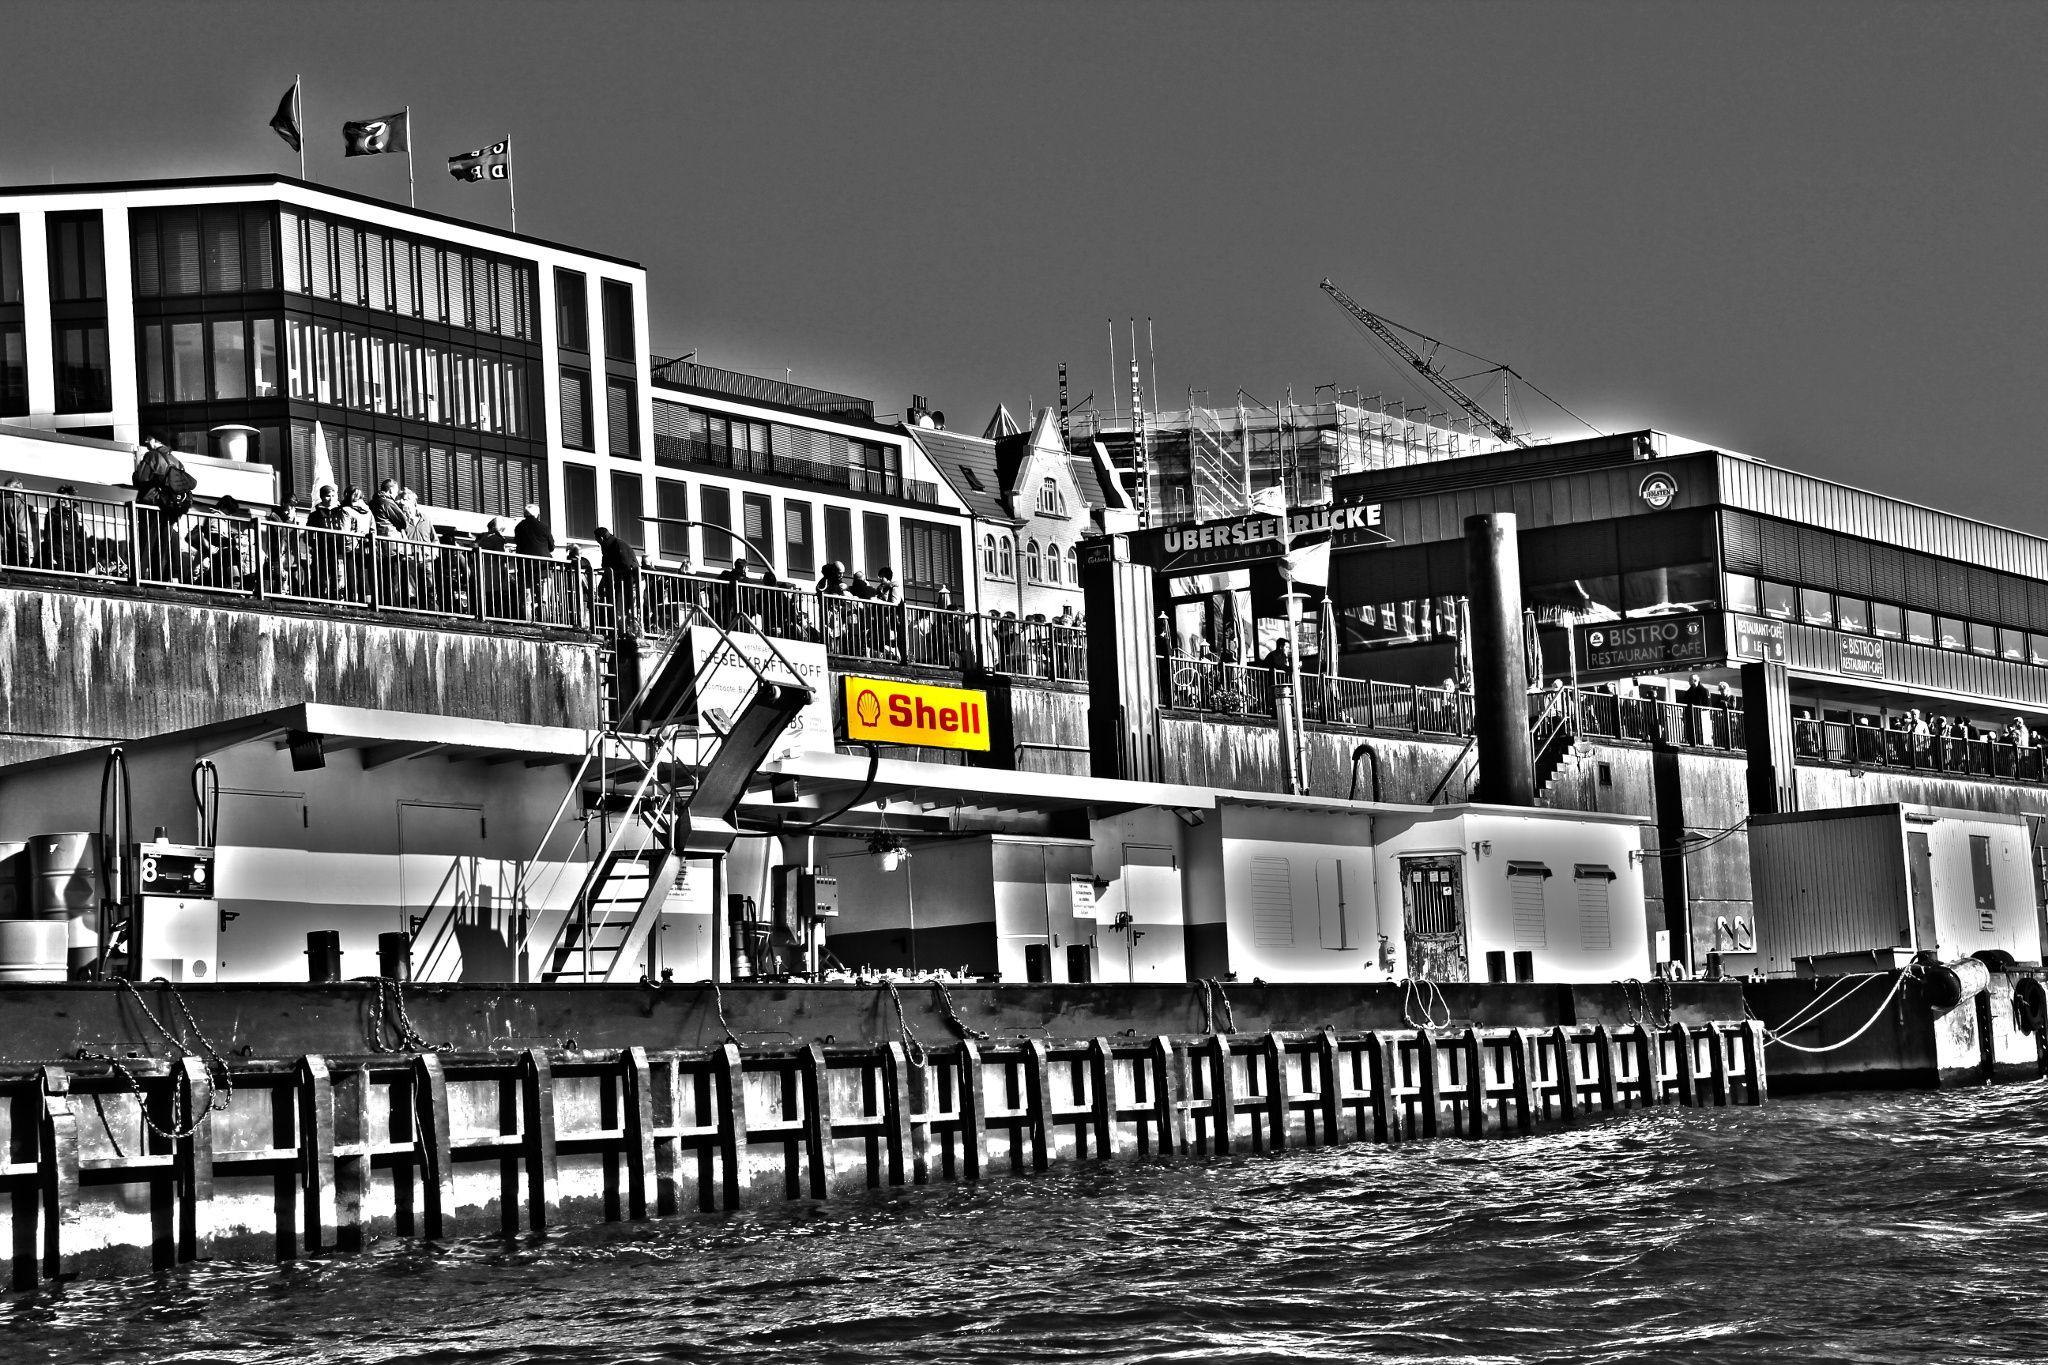 Gas Station for ships at the Port of Hamburg - Colourkey by Michael Schloz on 500px. #colorkey #hamburg #hamburgerhafen #portofhamburg #elbe #shell #tankstelle #gasstation #überseebrücke